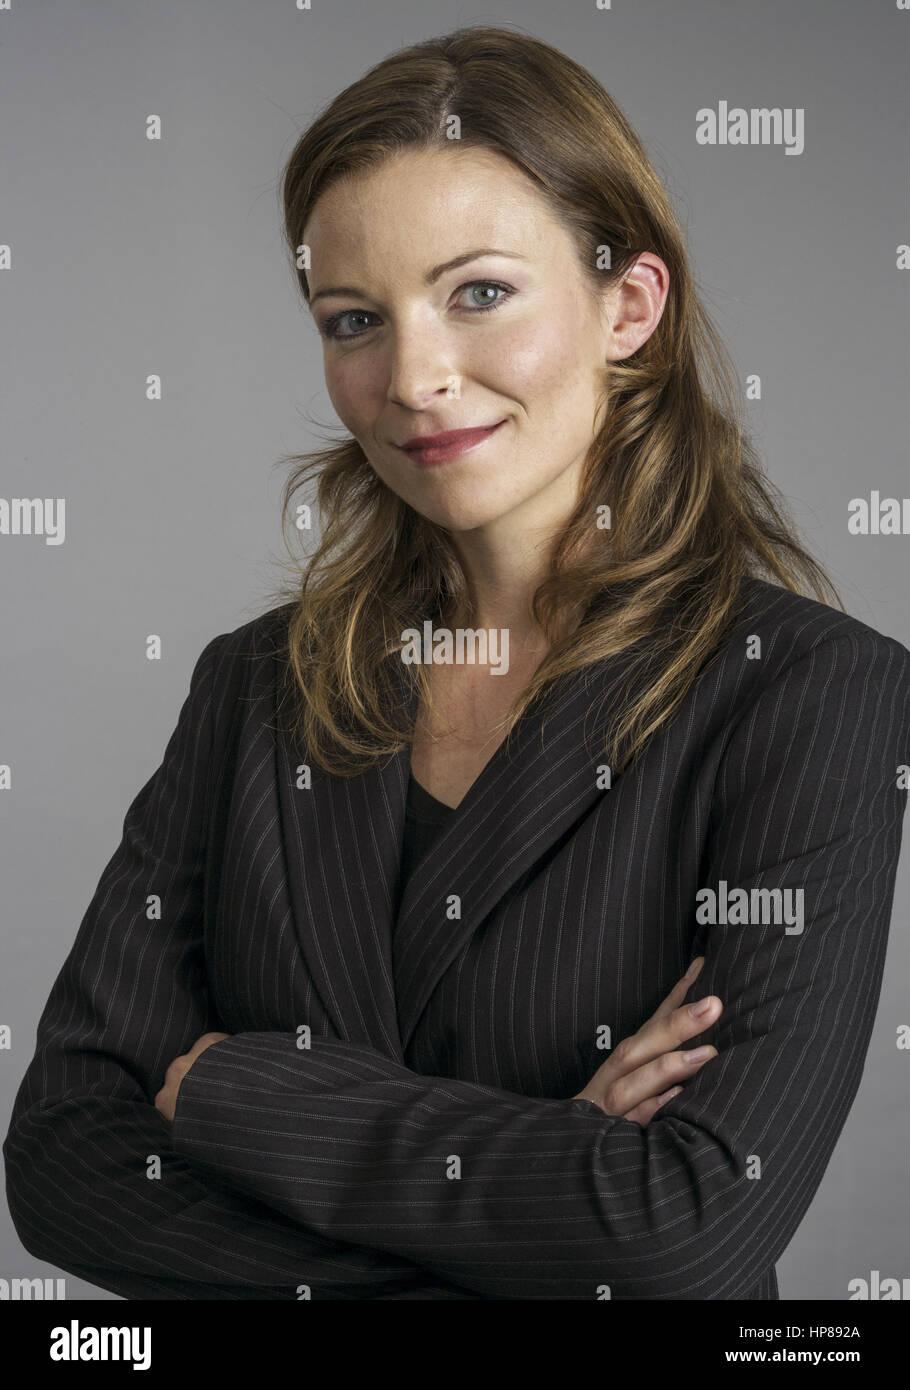 Frau im Anzug, verschraenkte Arme, Halbportraet (model-released) Stock Photo